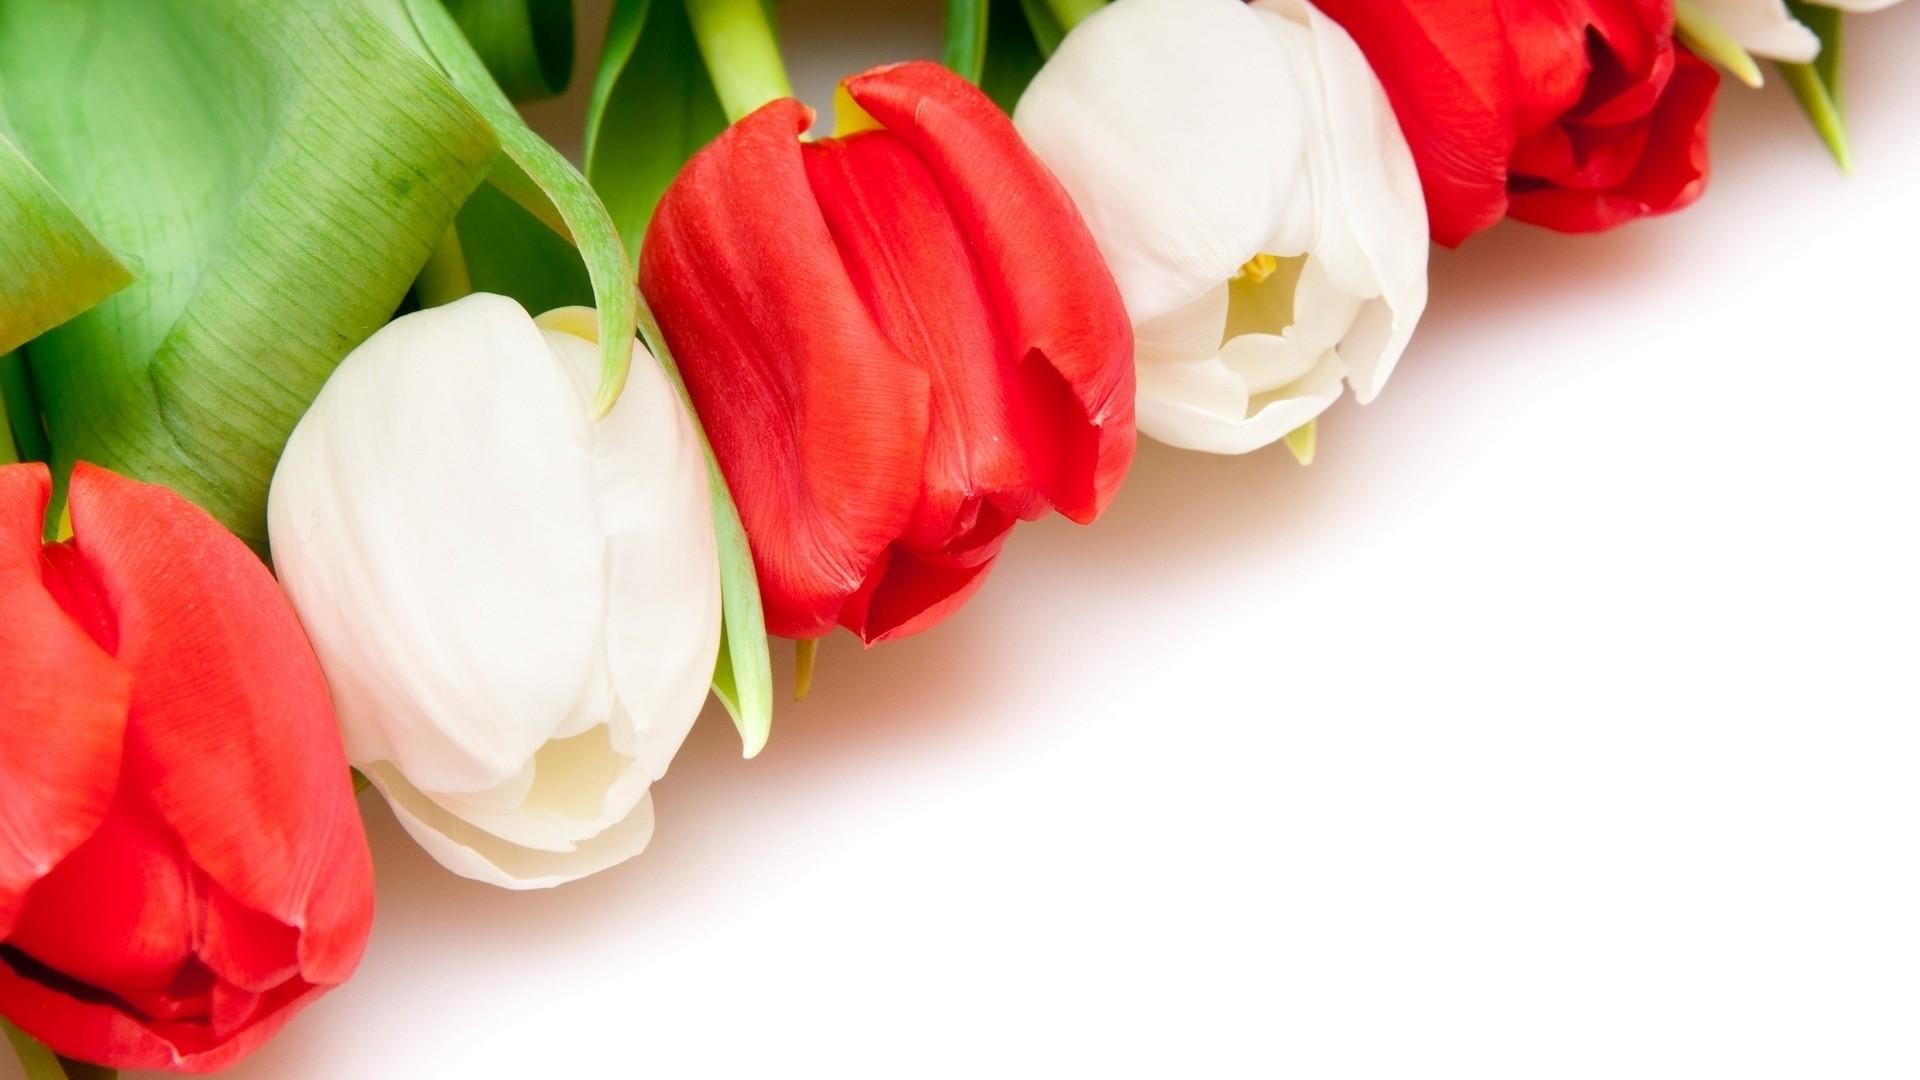 International Women's Day Flowers download image